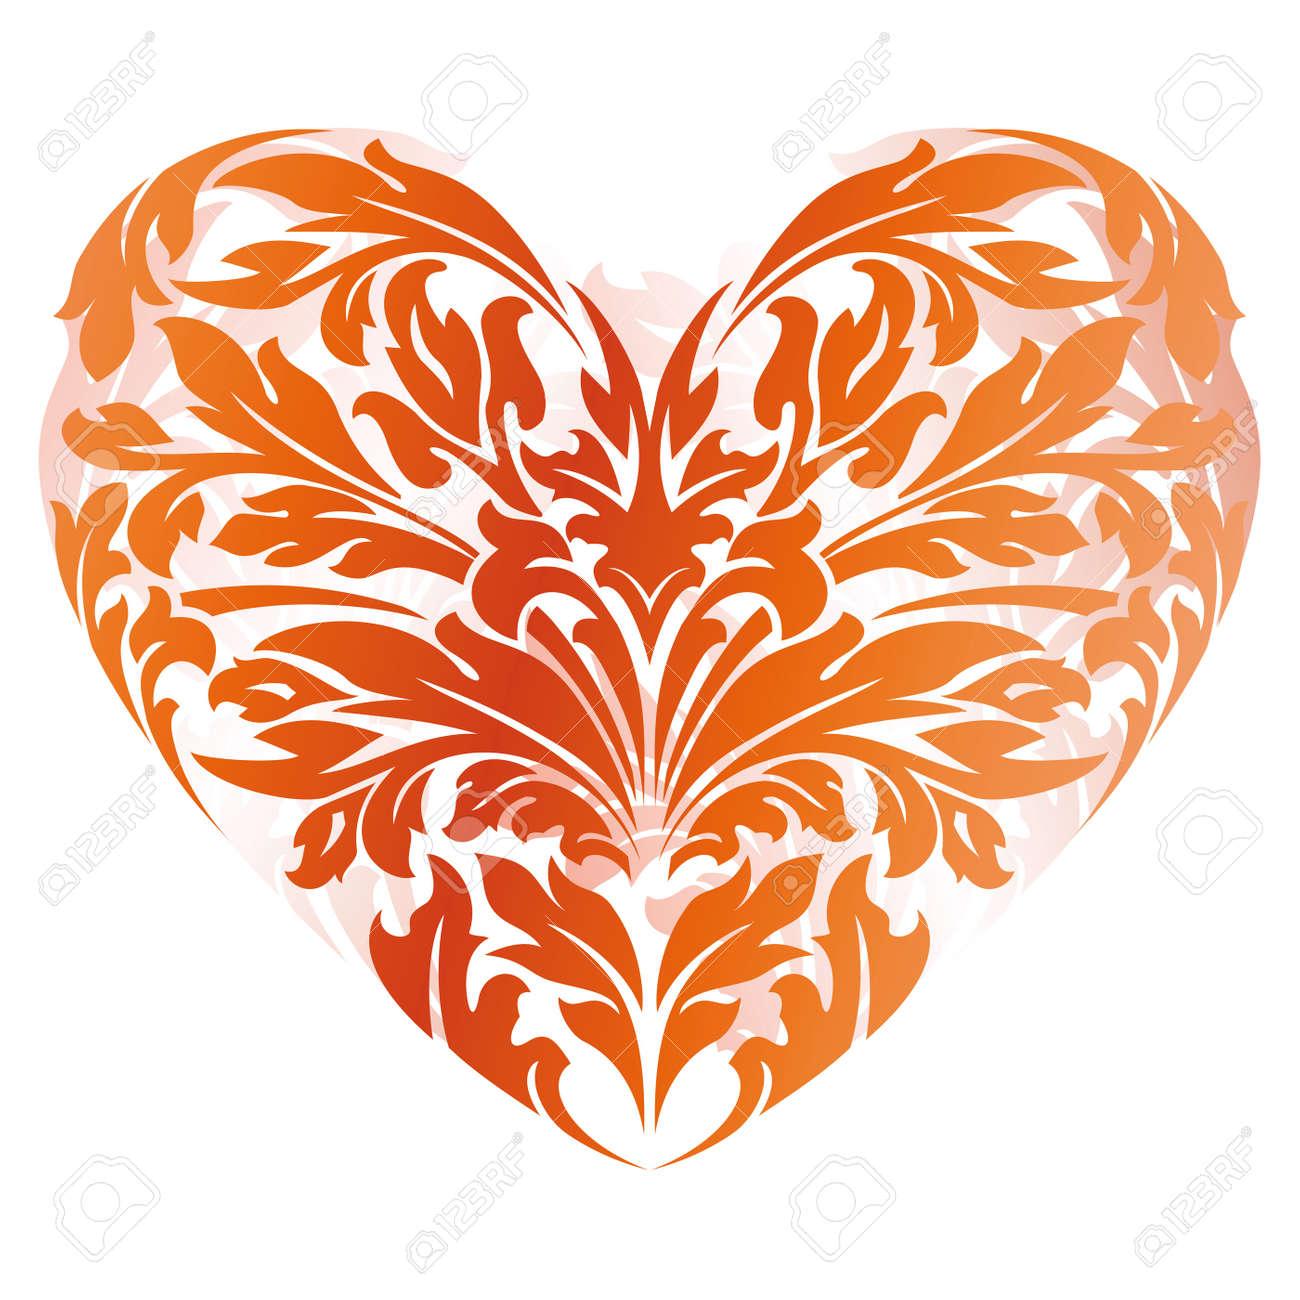 stylized valentine u0027s day heart isolated on white royalty free